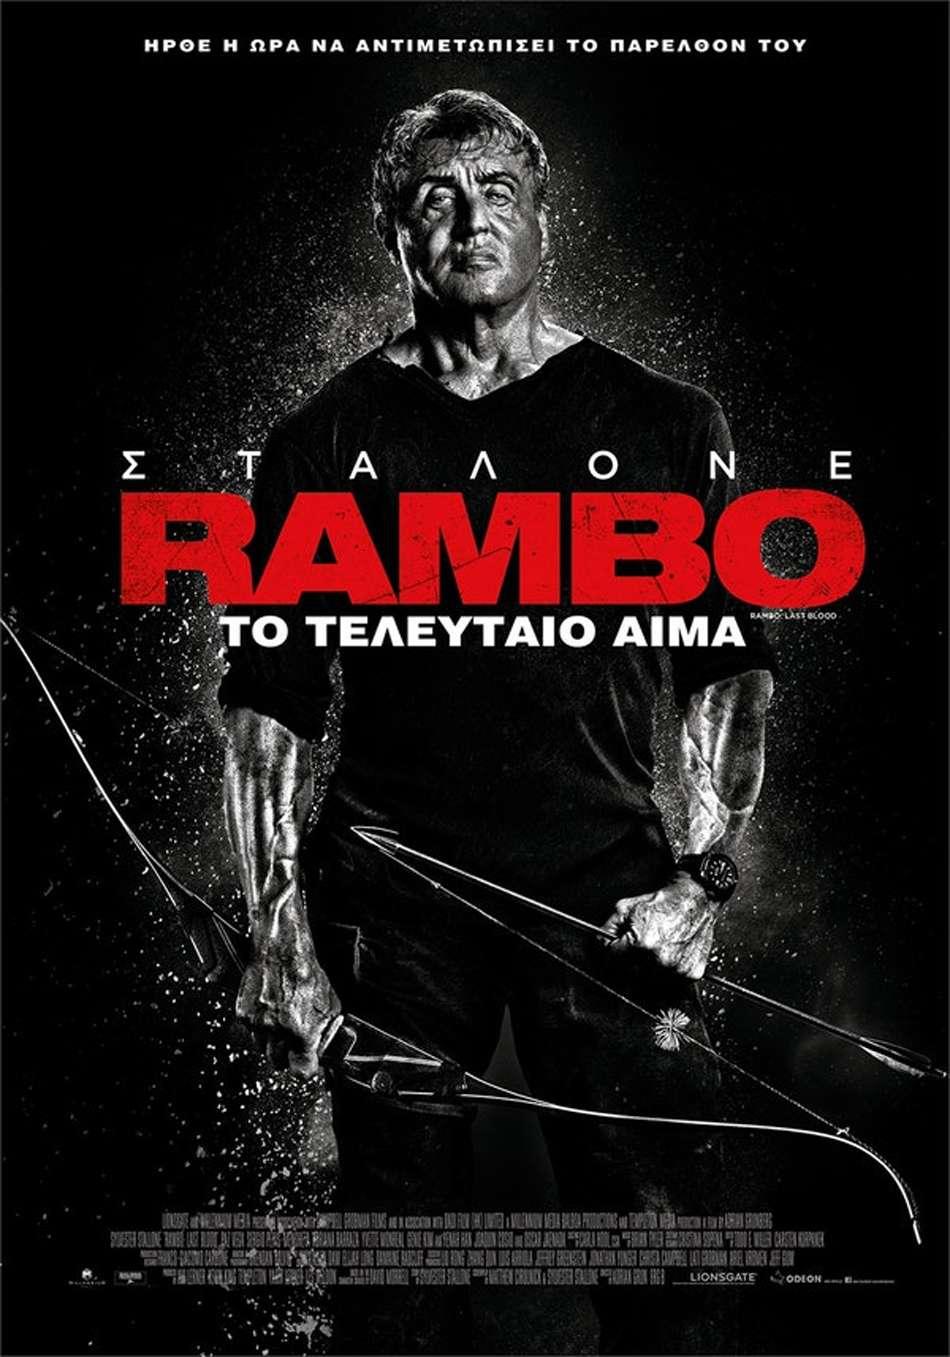 Rambo: Το Τελευταίο Αίμα (Rambo: Last Blood) - Trailer / Τρέιλερ Poster